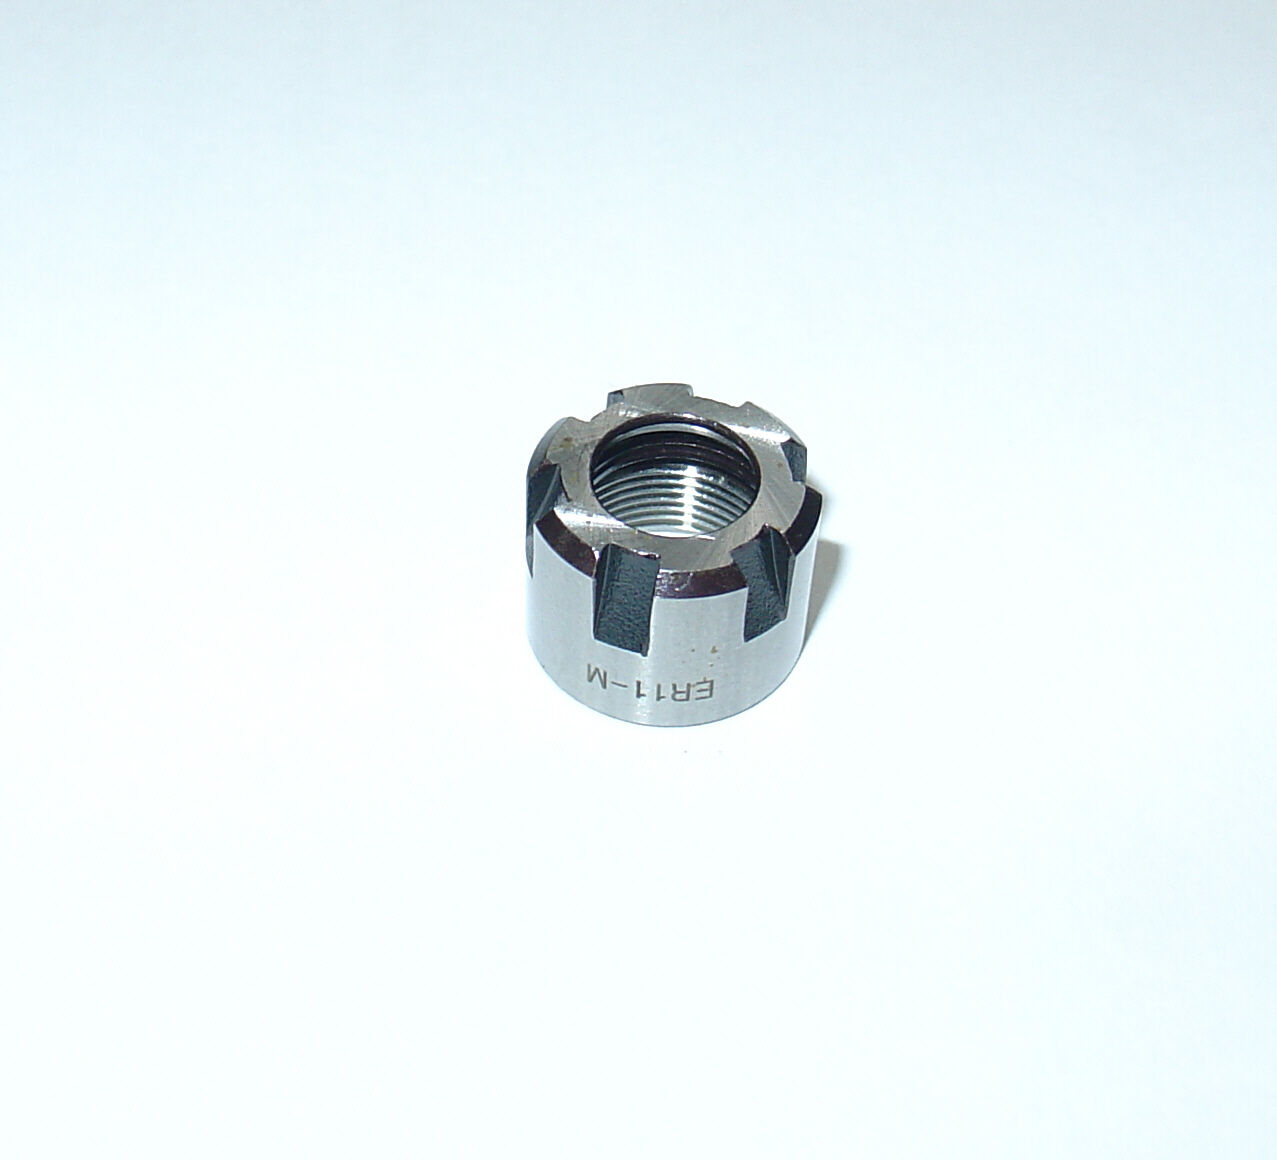 Schlüssel für ER8 ER50 Mutter Mini A H OM UM Spannschlüssel Spannzangenfutter